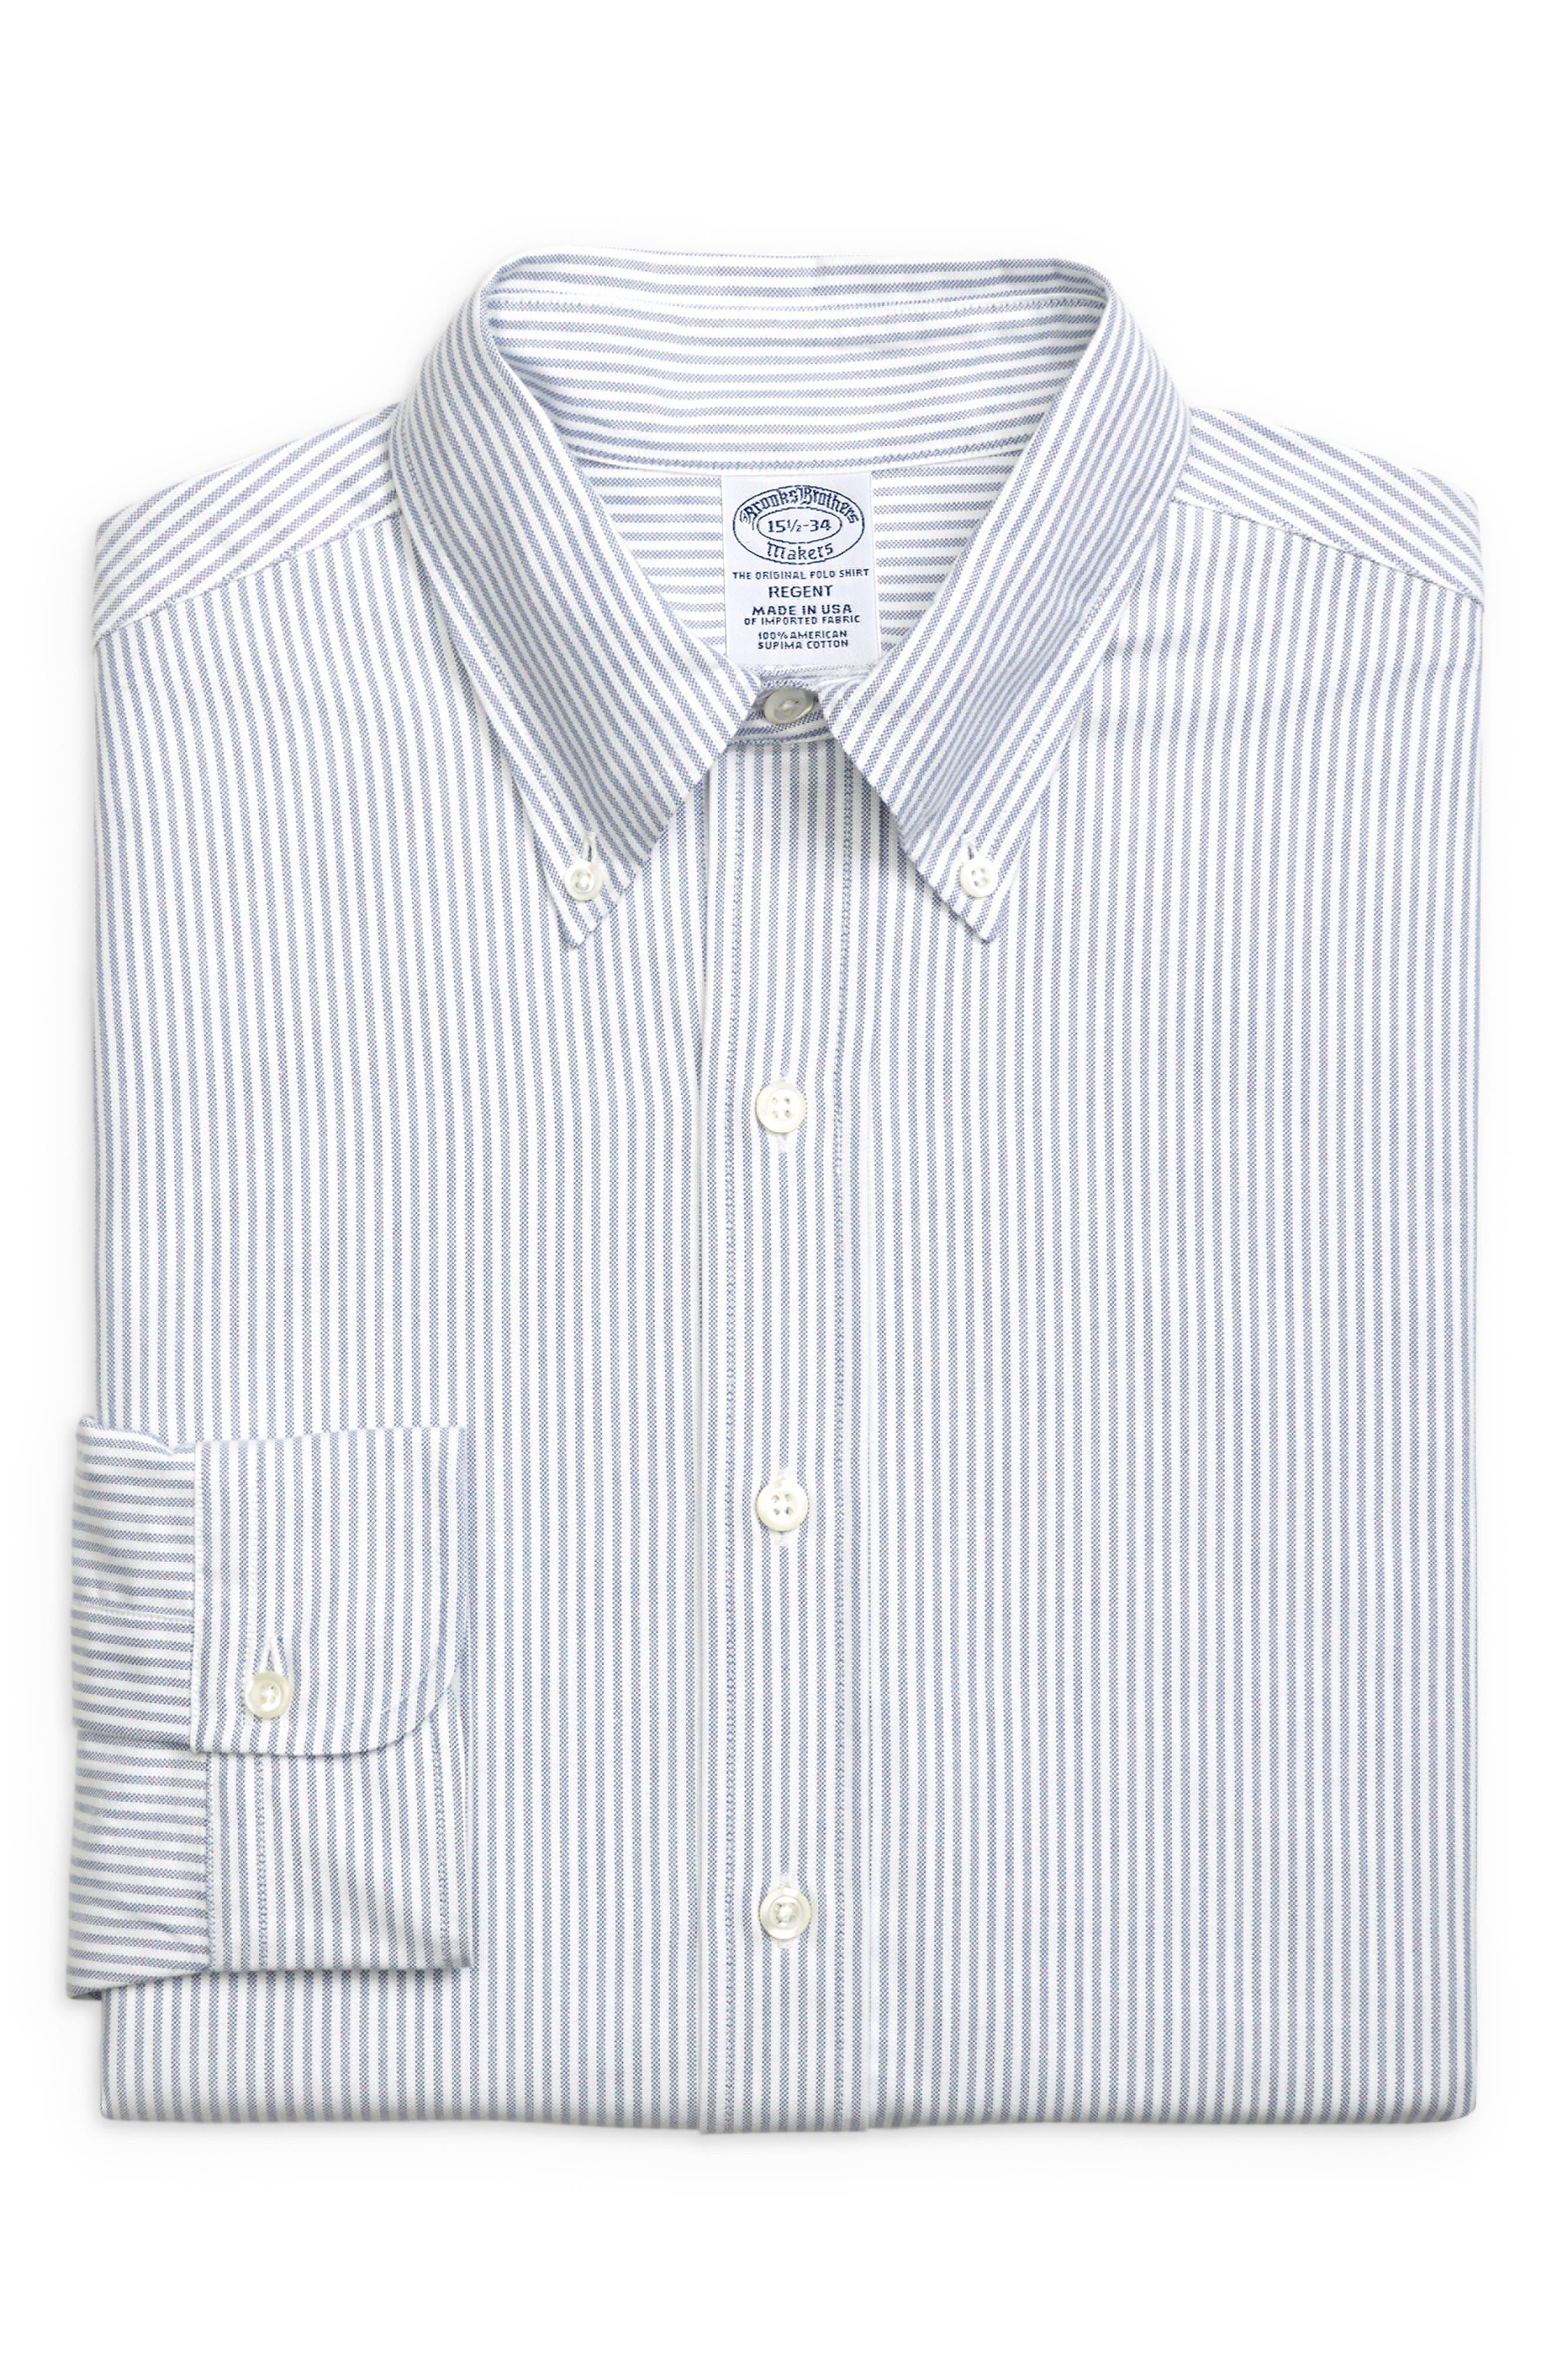 Regent Regular Fit Stripe Dress Shirt